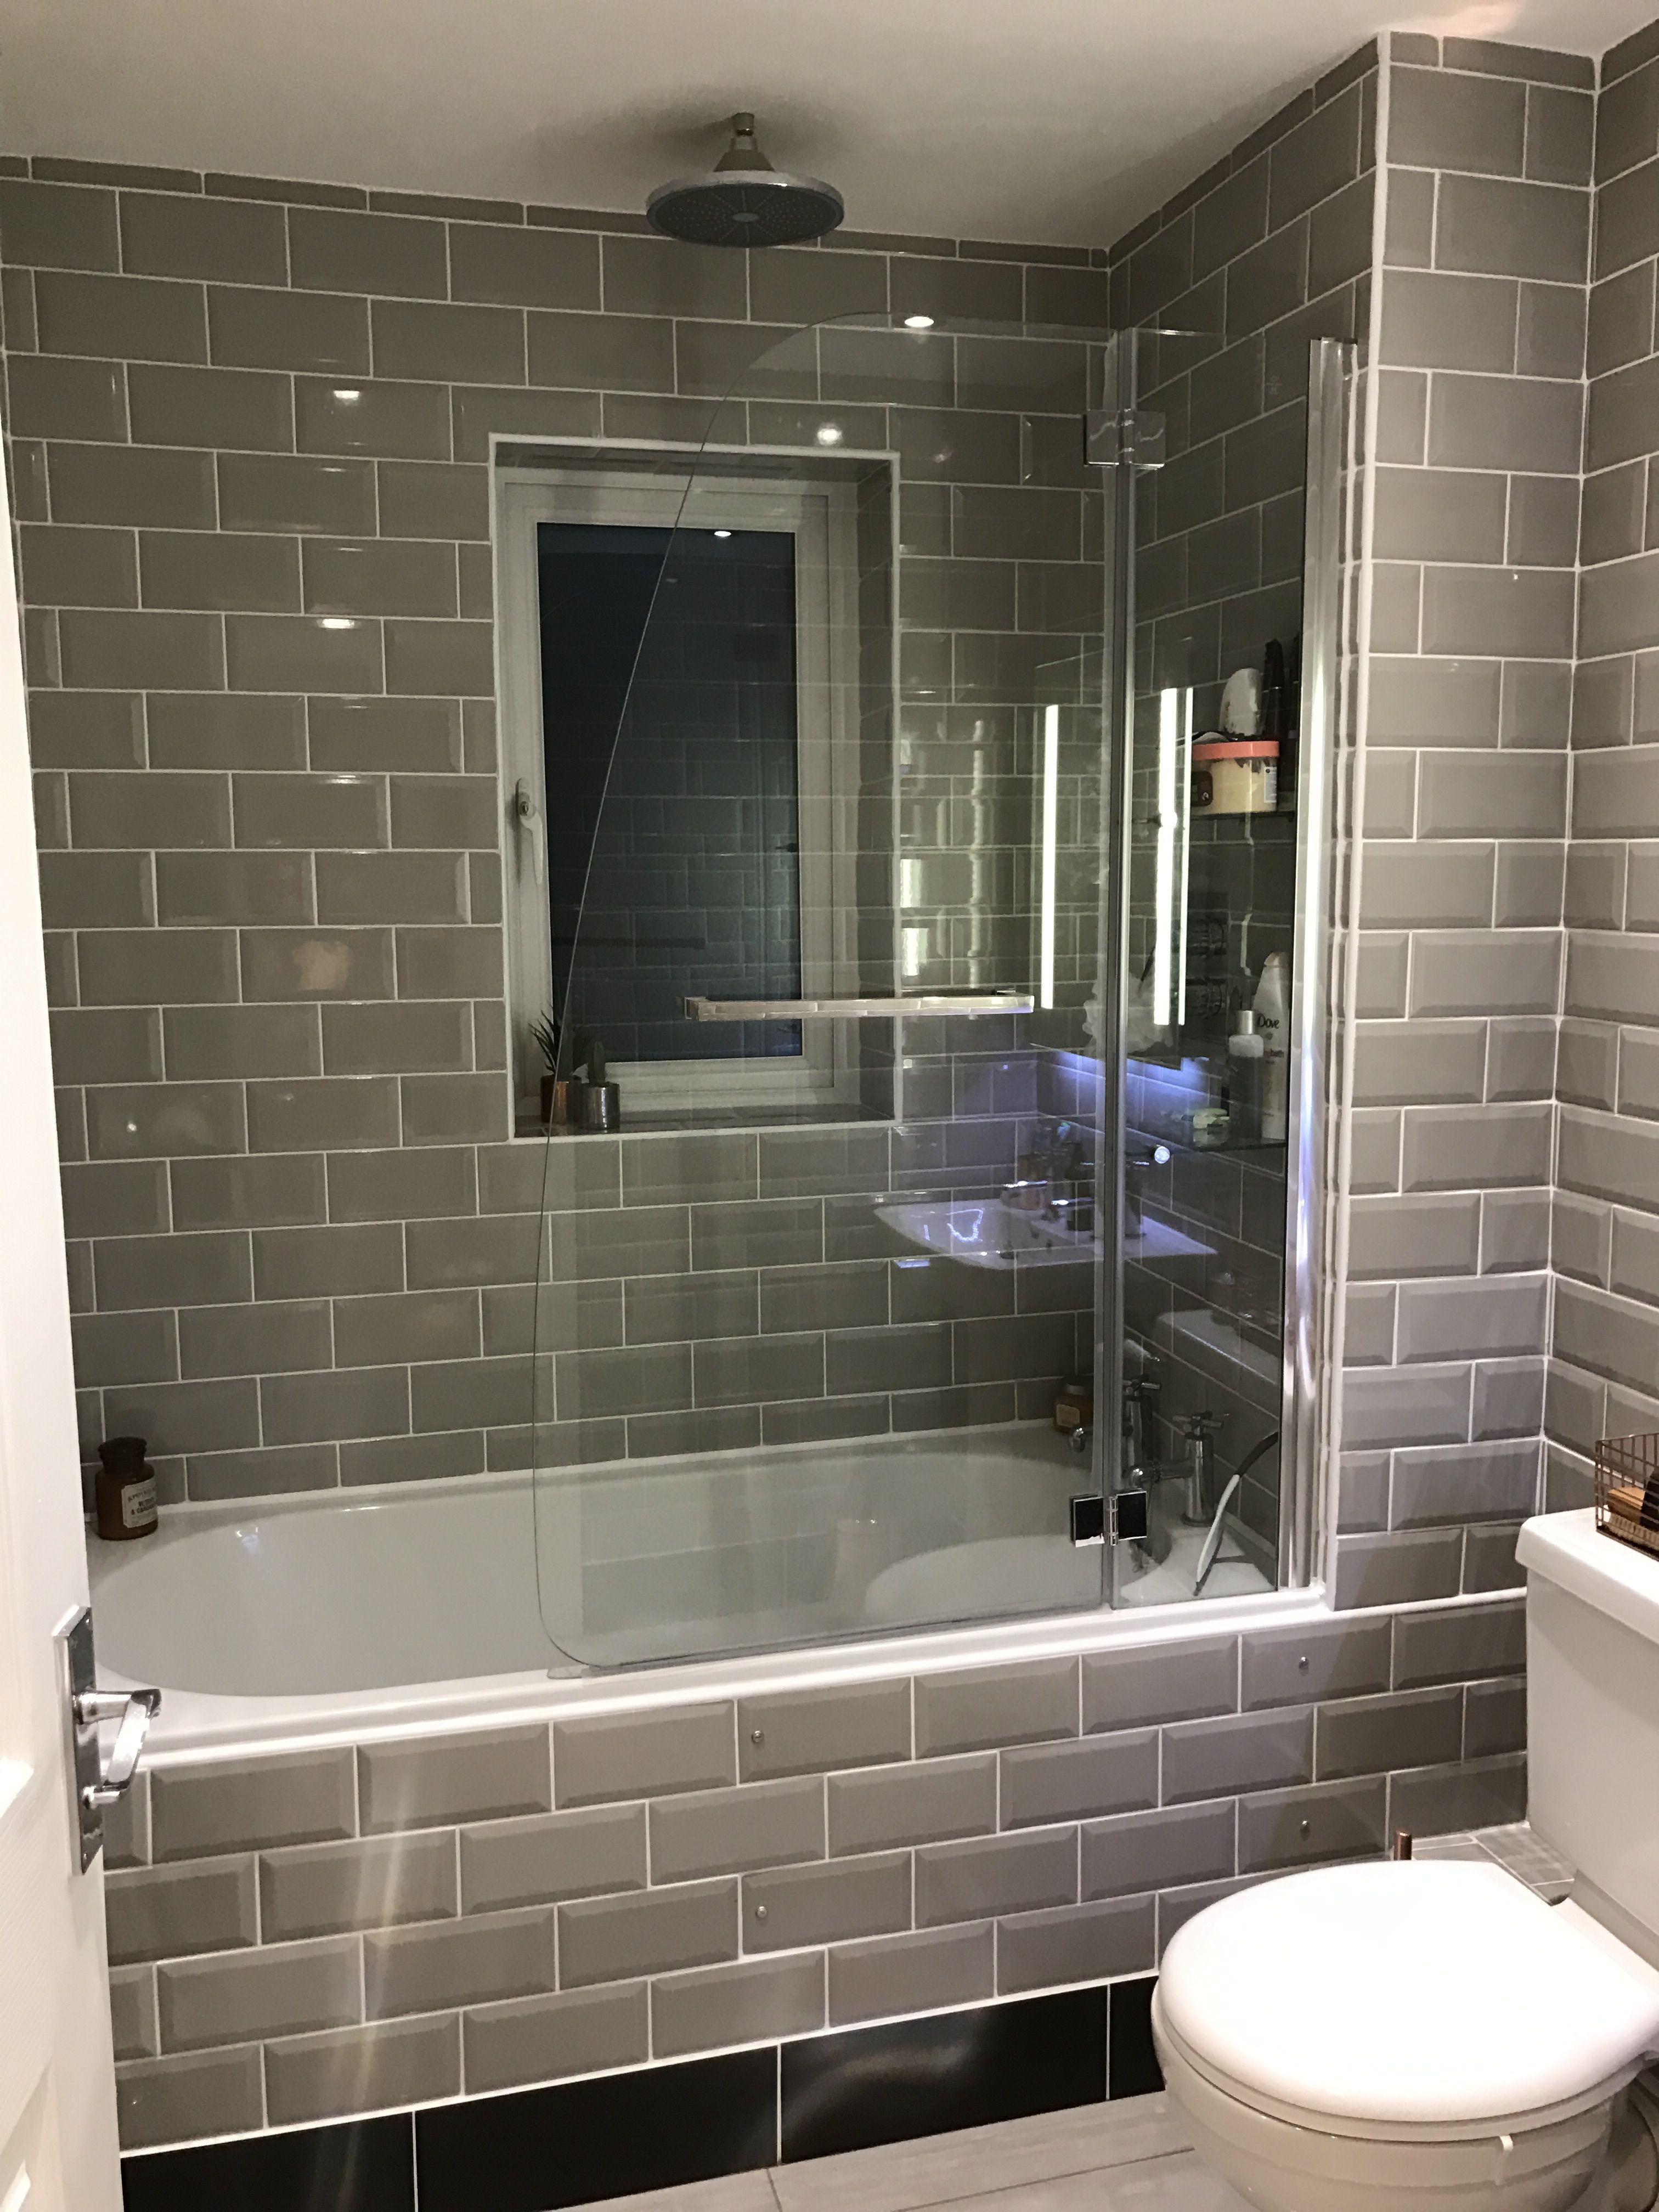 My New Bathroom Grey Subway Tiles Shower Screen From Victoria Plum Grey Subway Tiles Bathroom Shower Screen